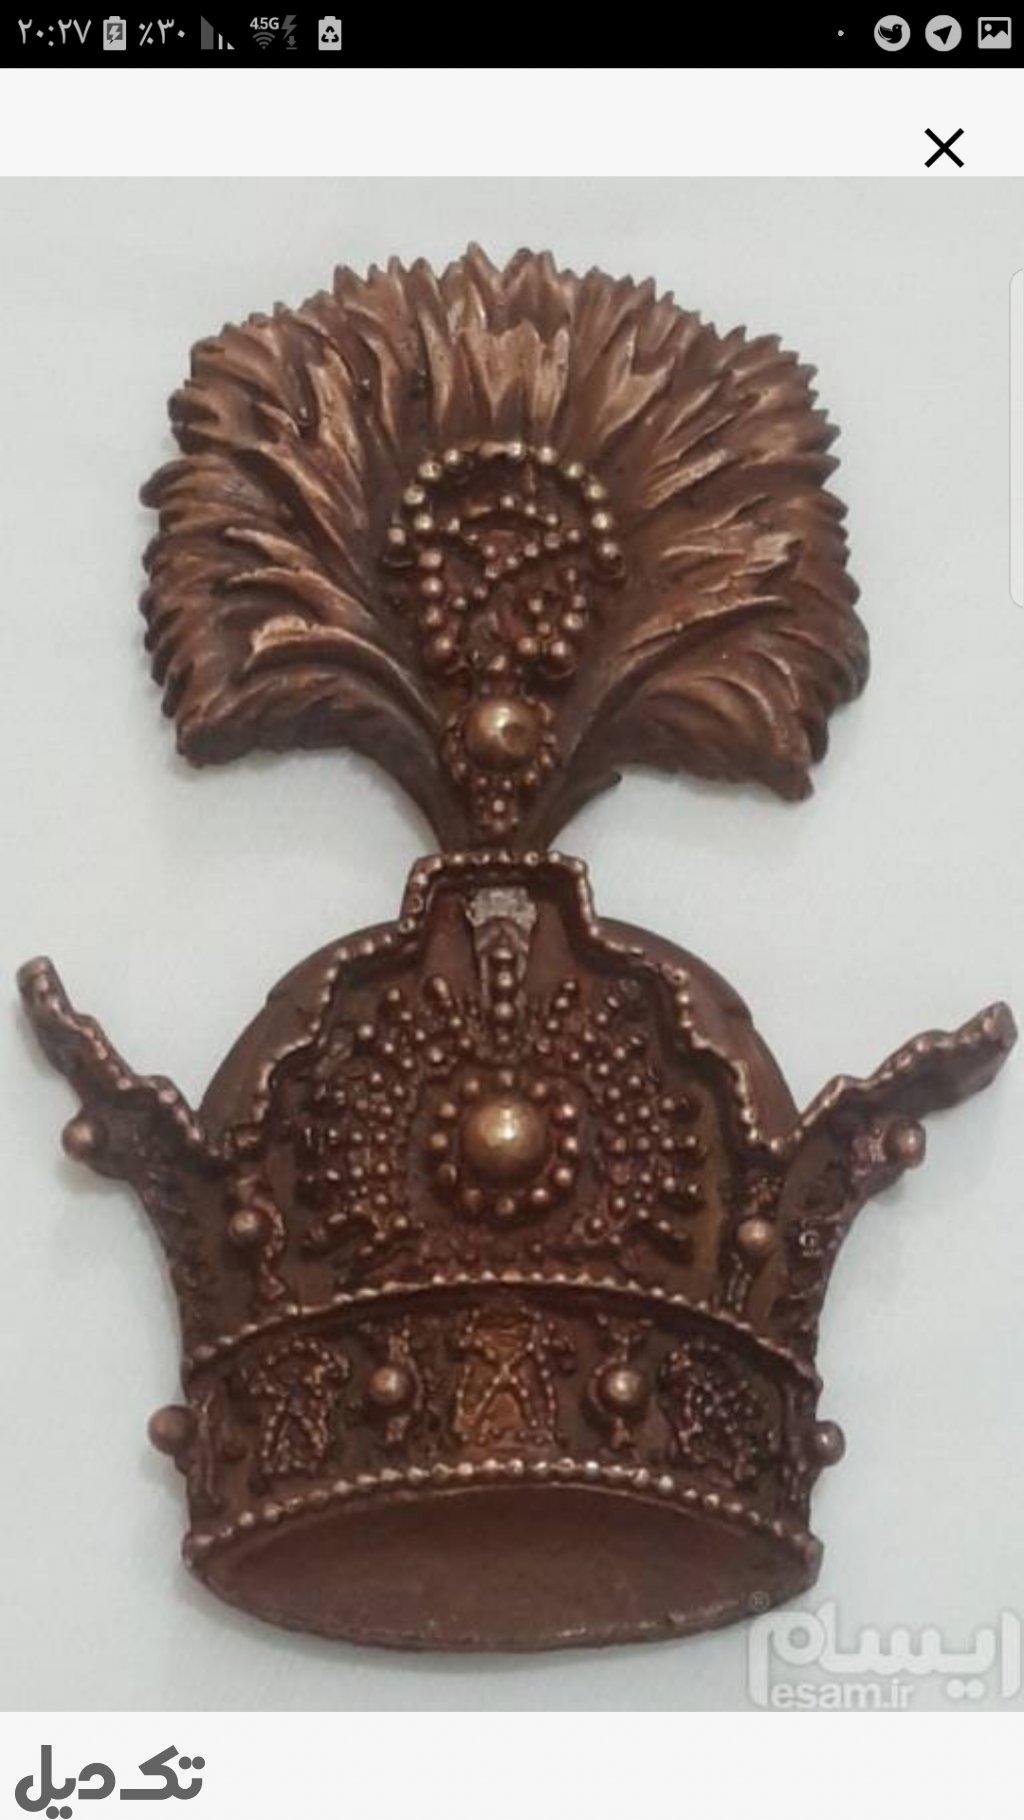 مدال برنز تاج نایاب